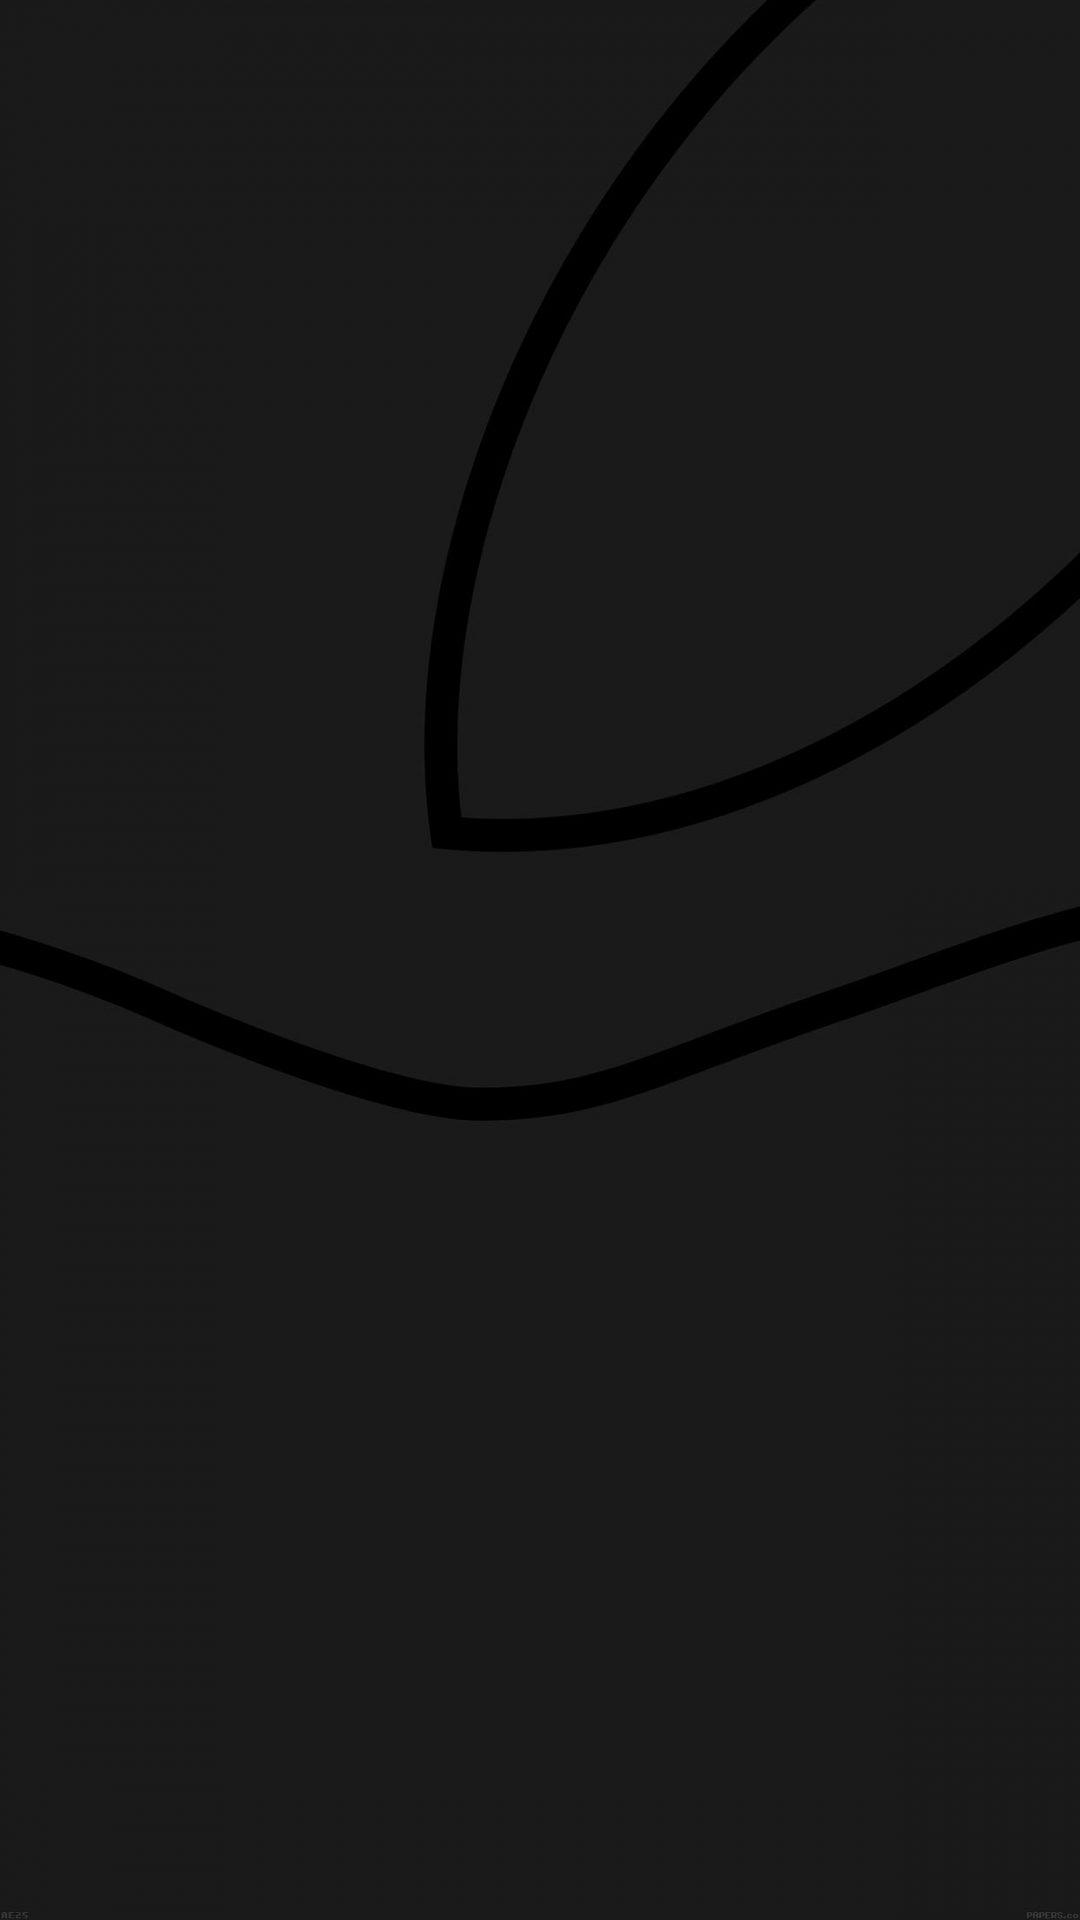 Apple Event 2014 Oct 16 Dark Black